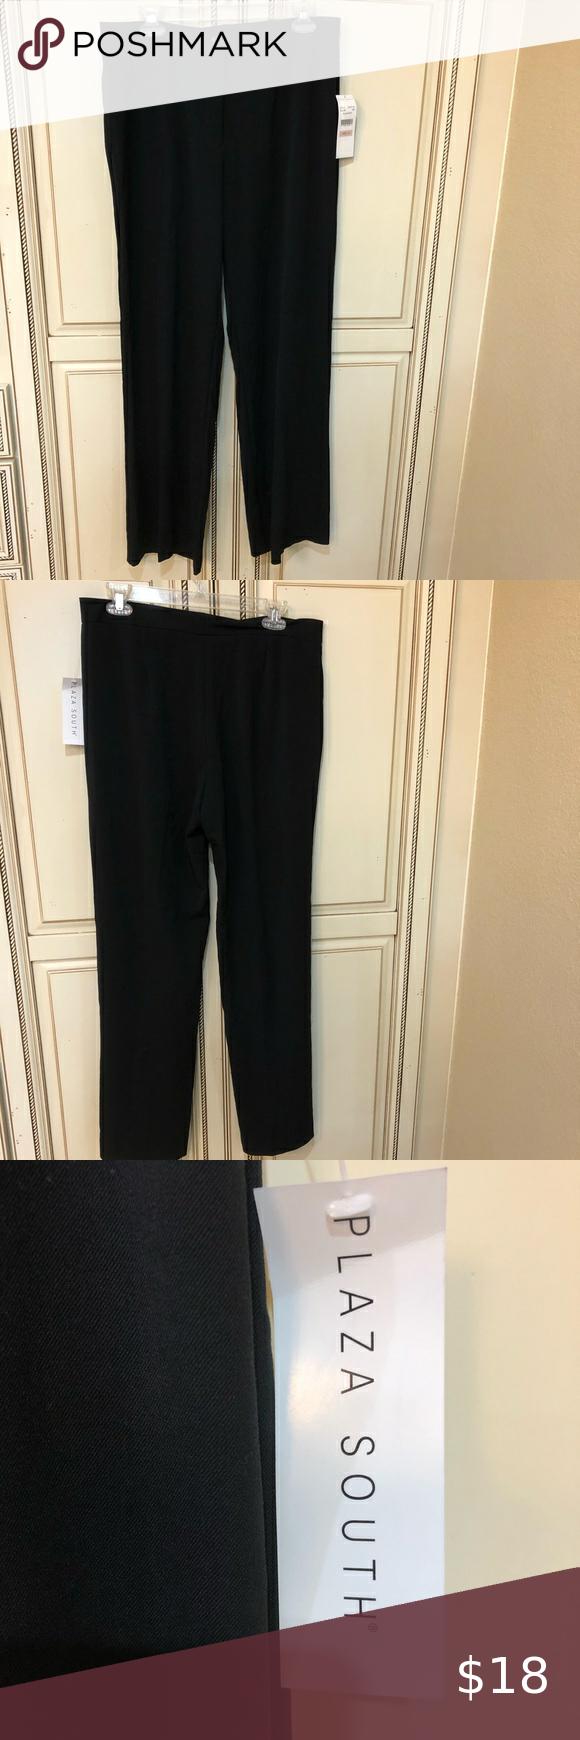 Tall Nwt Black Dress Pants By Plaza South Size 12 Black Dress Pants Dress Pants Floral Wide Leg Trousers [ 1740 x 580 Pixel ]